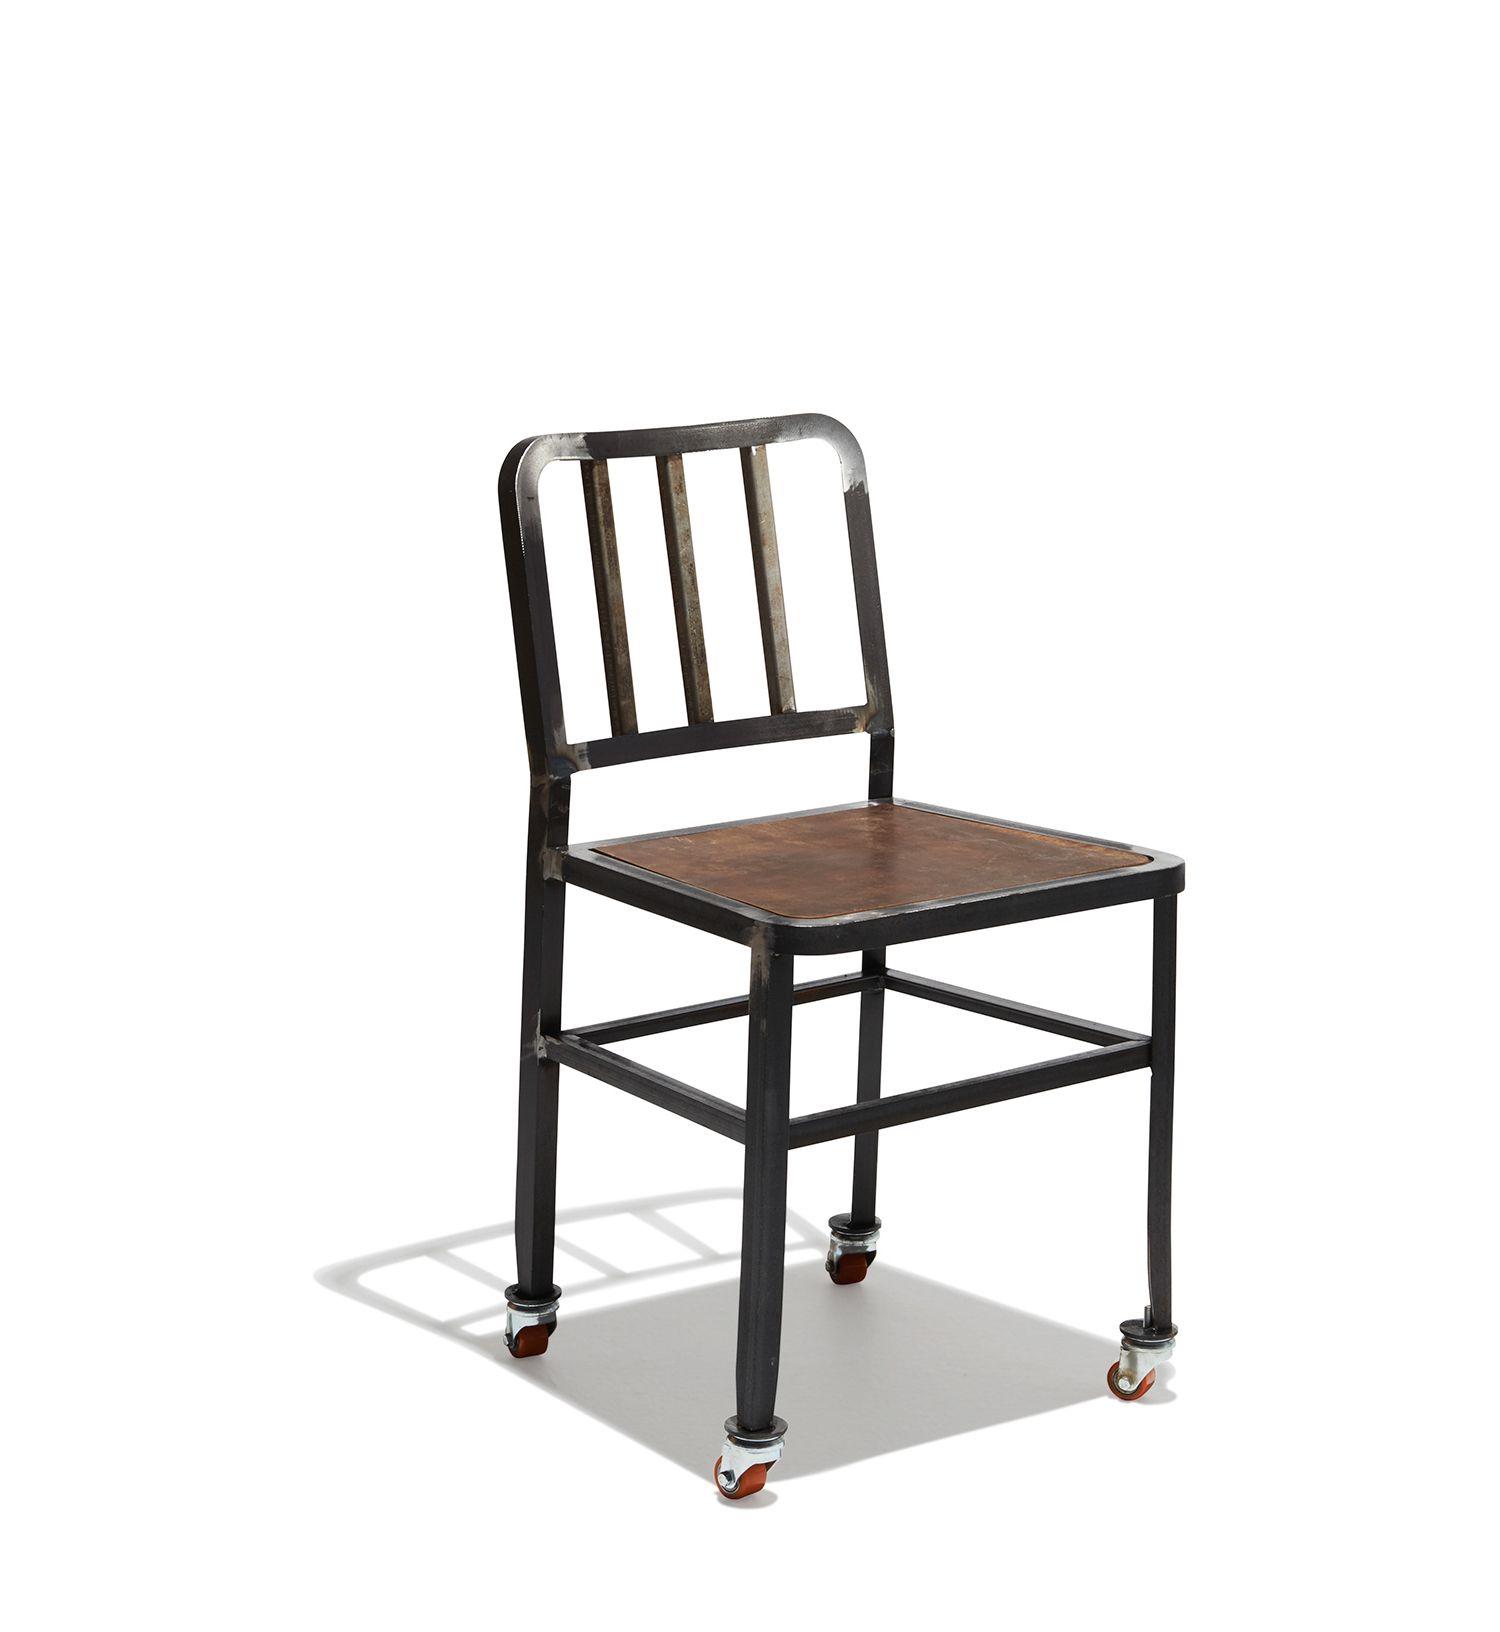 Dr richmond task chair chair task chair outdoor chairs